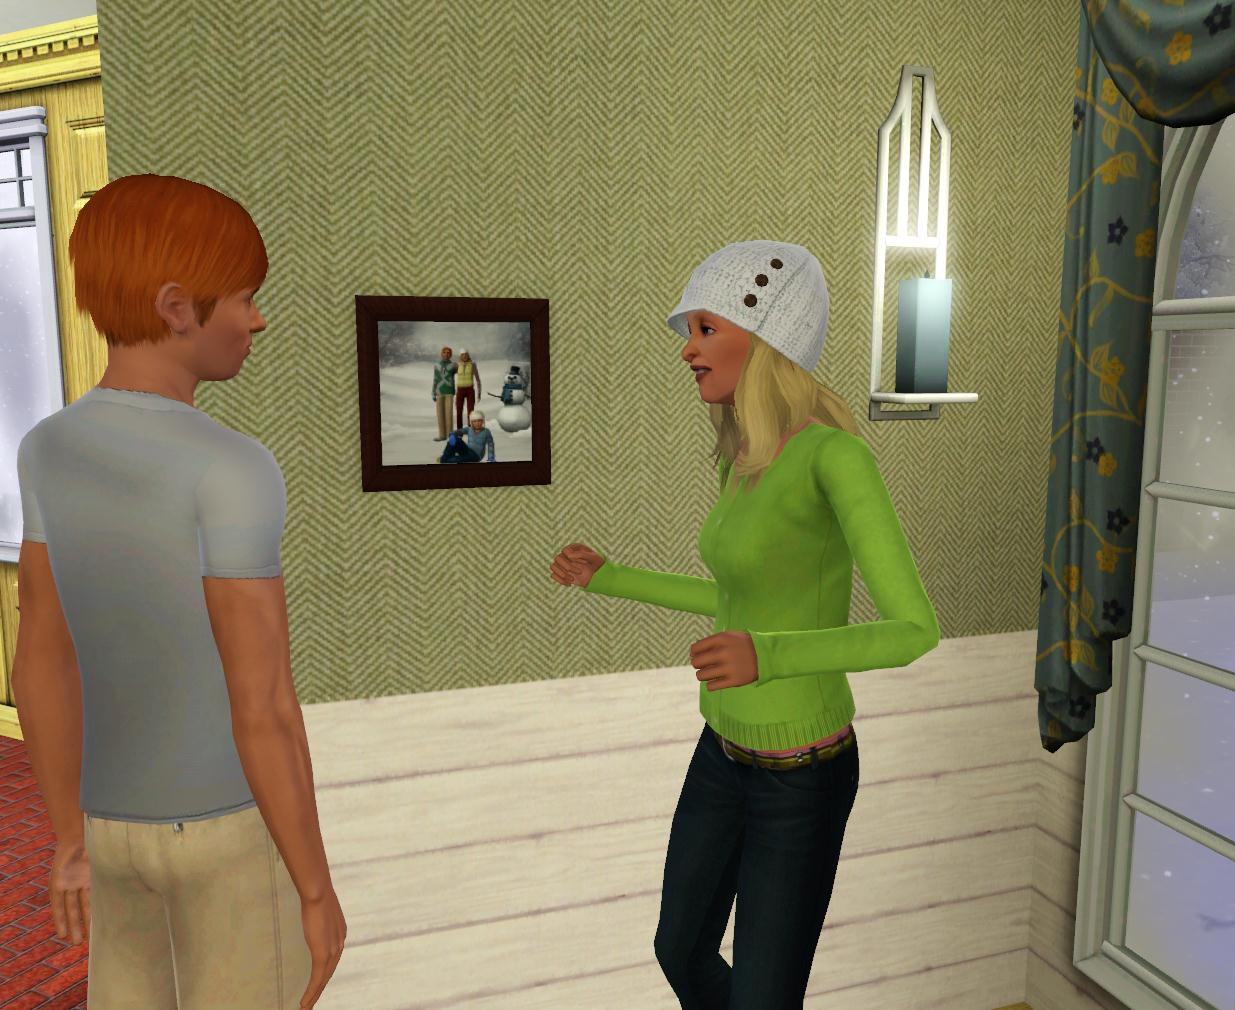 The Sims 3 Årstiders storhelgsblogg